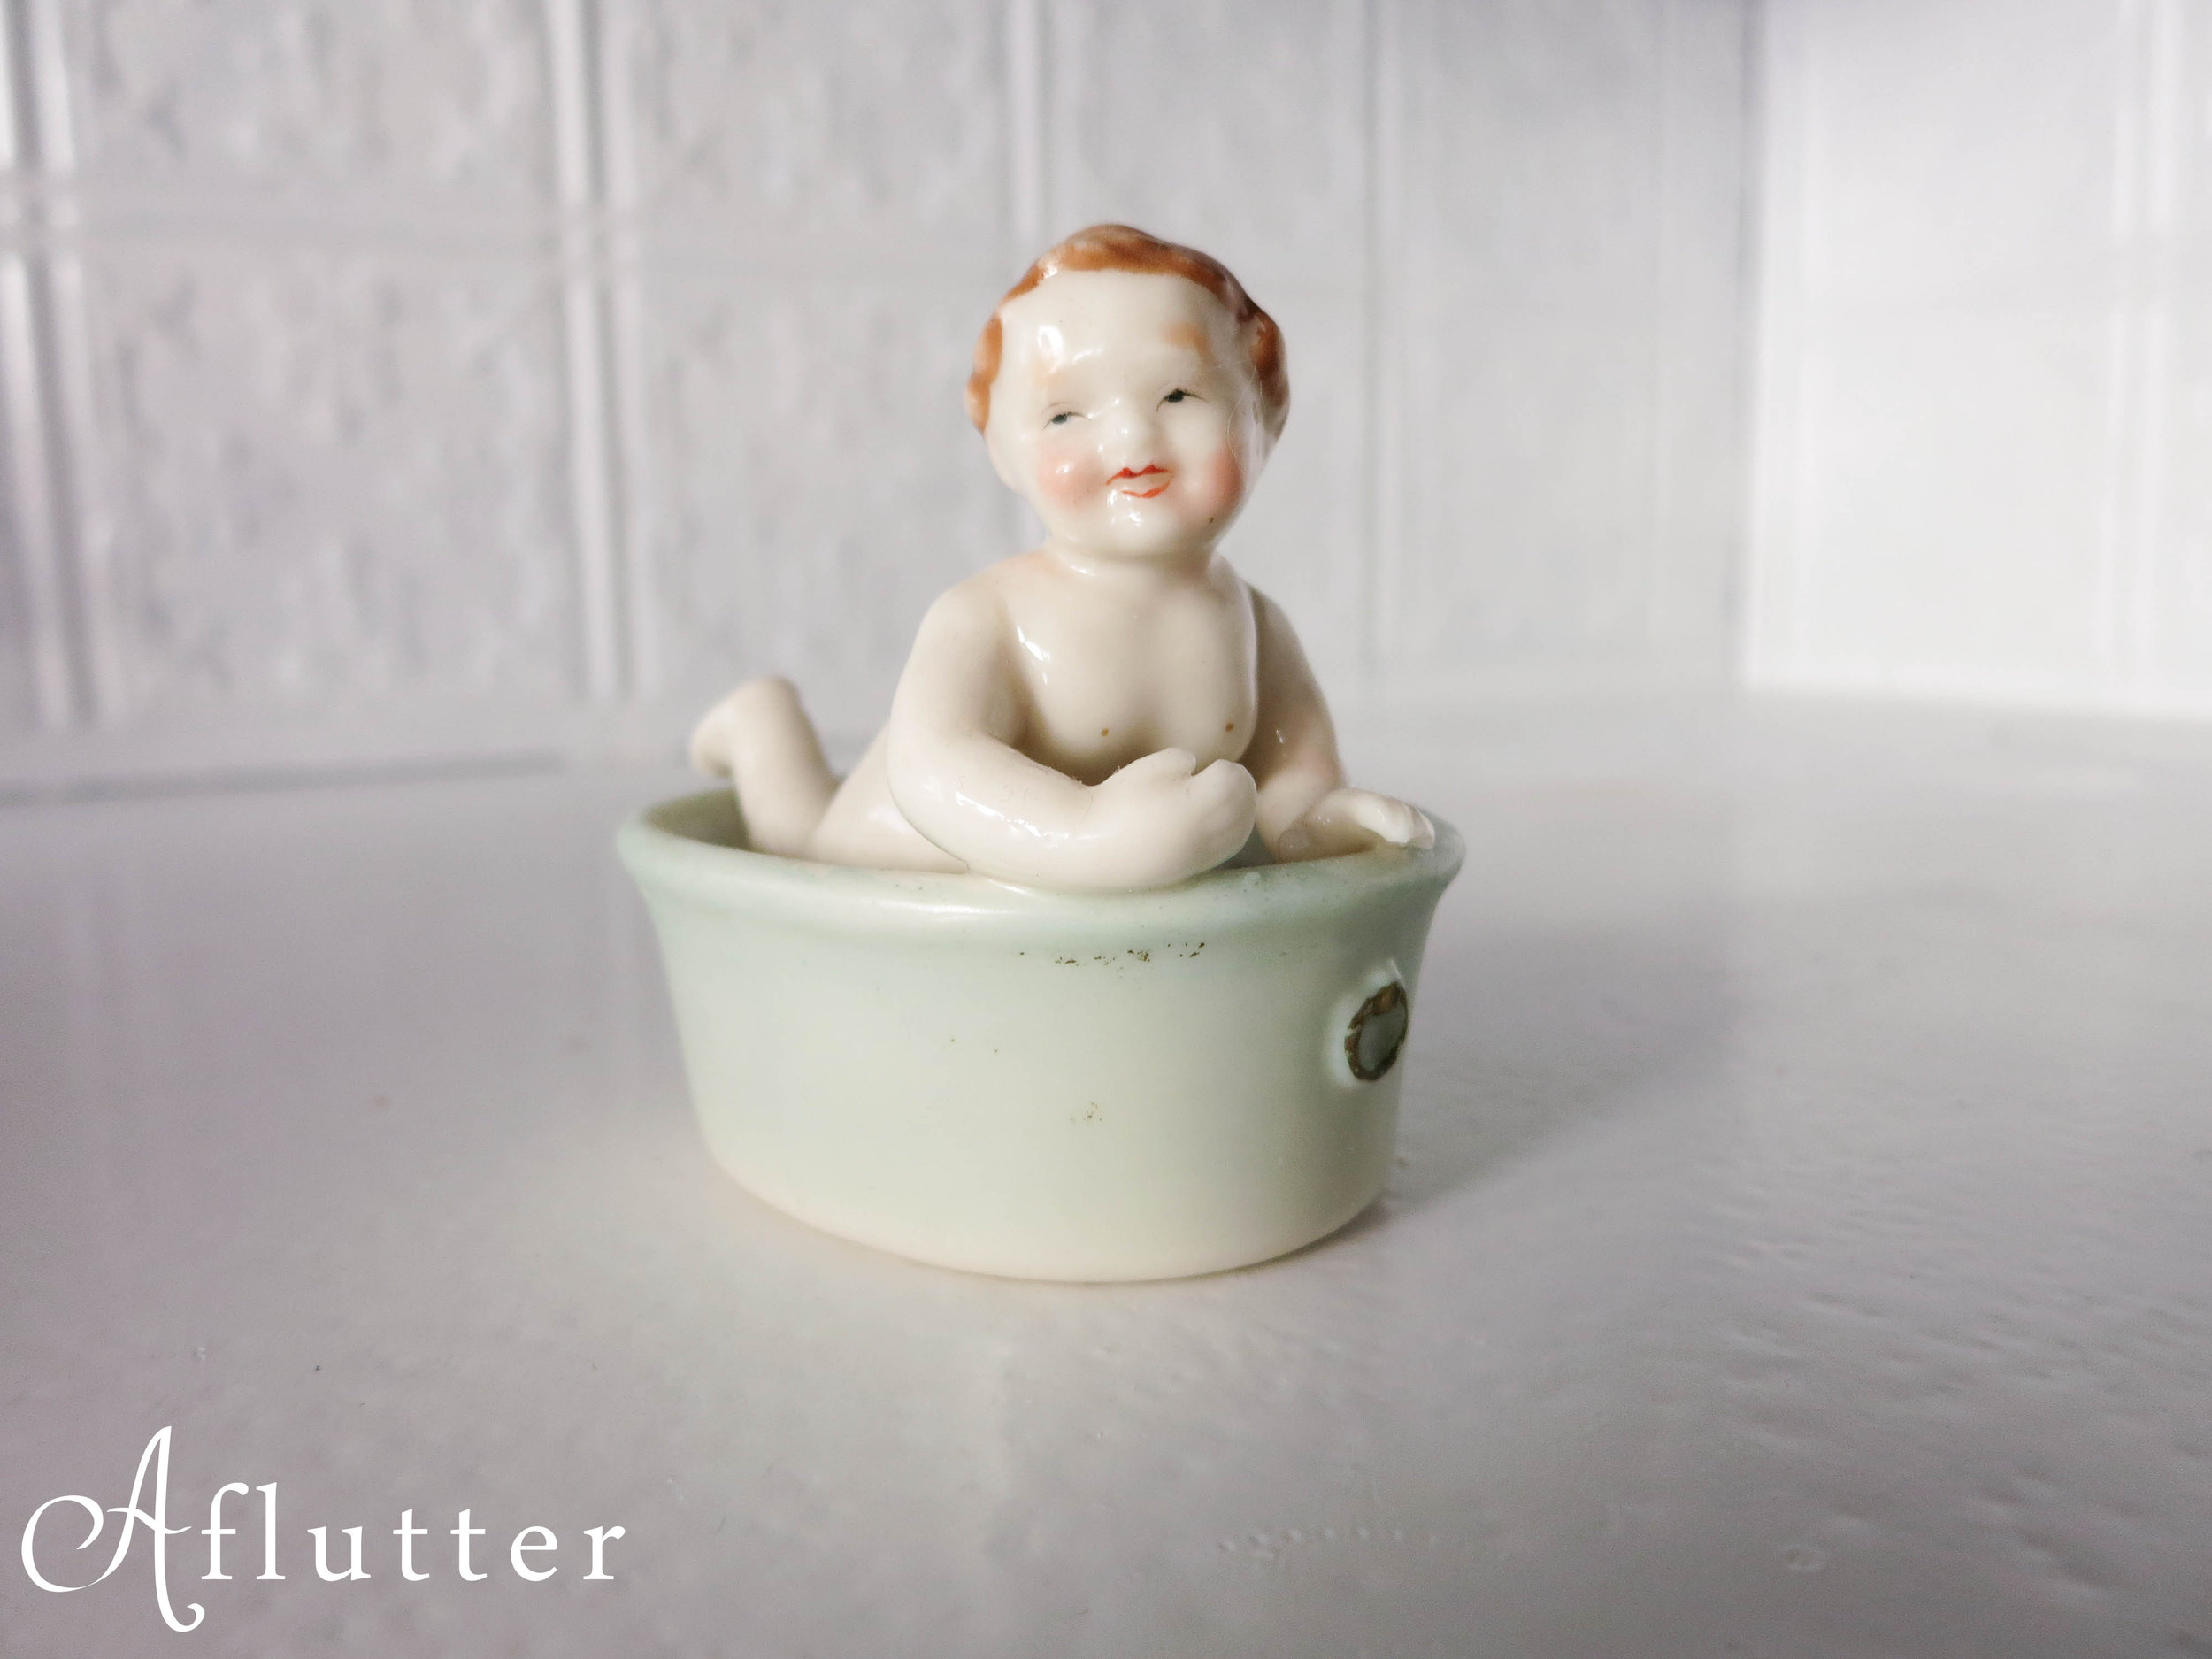 Bath-inspiration-figurine-1-of-1.jpg